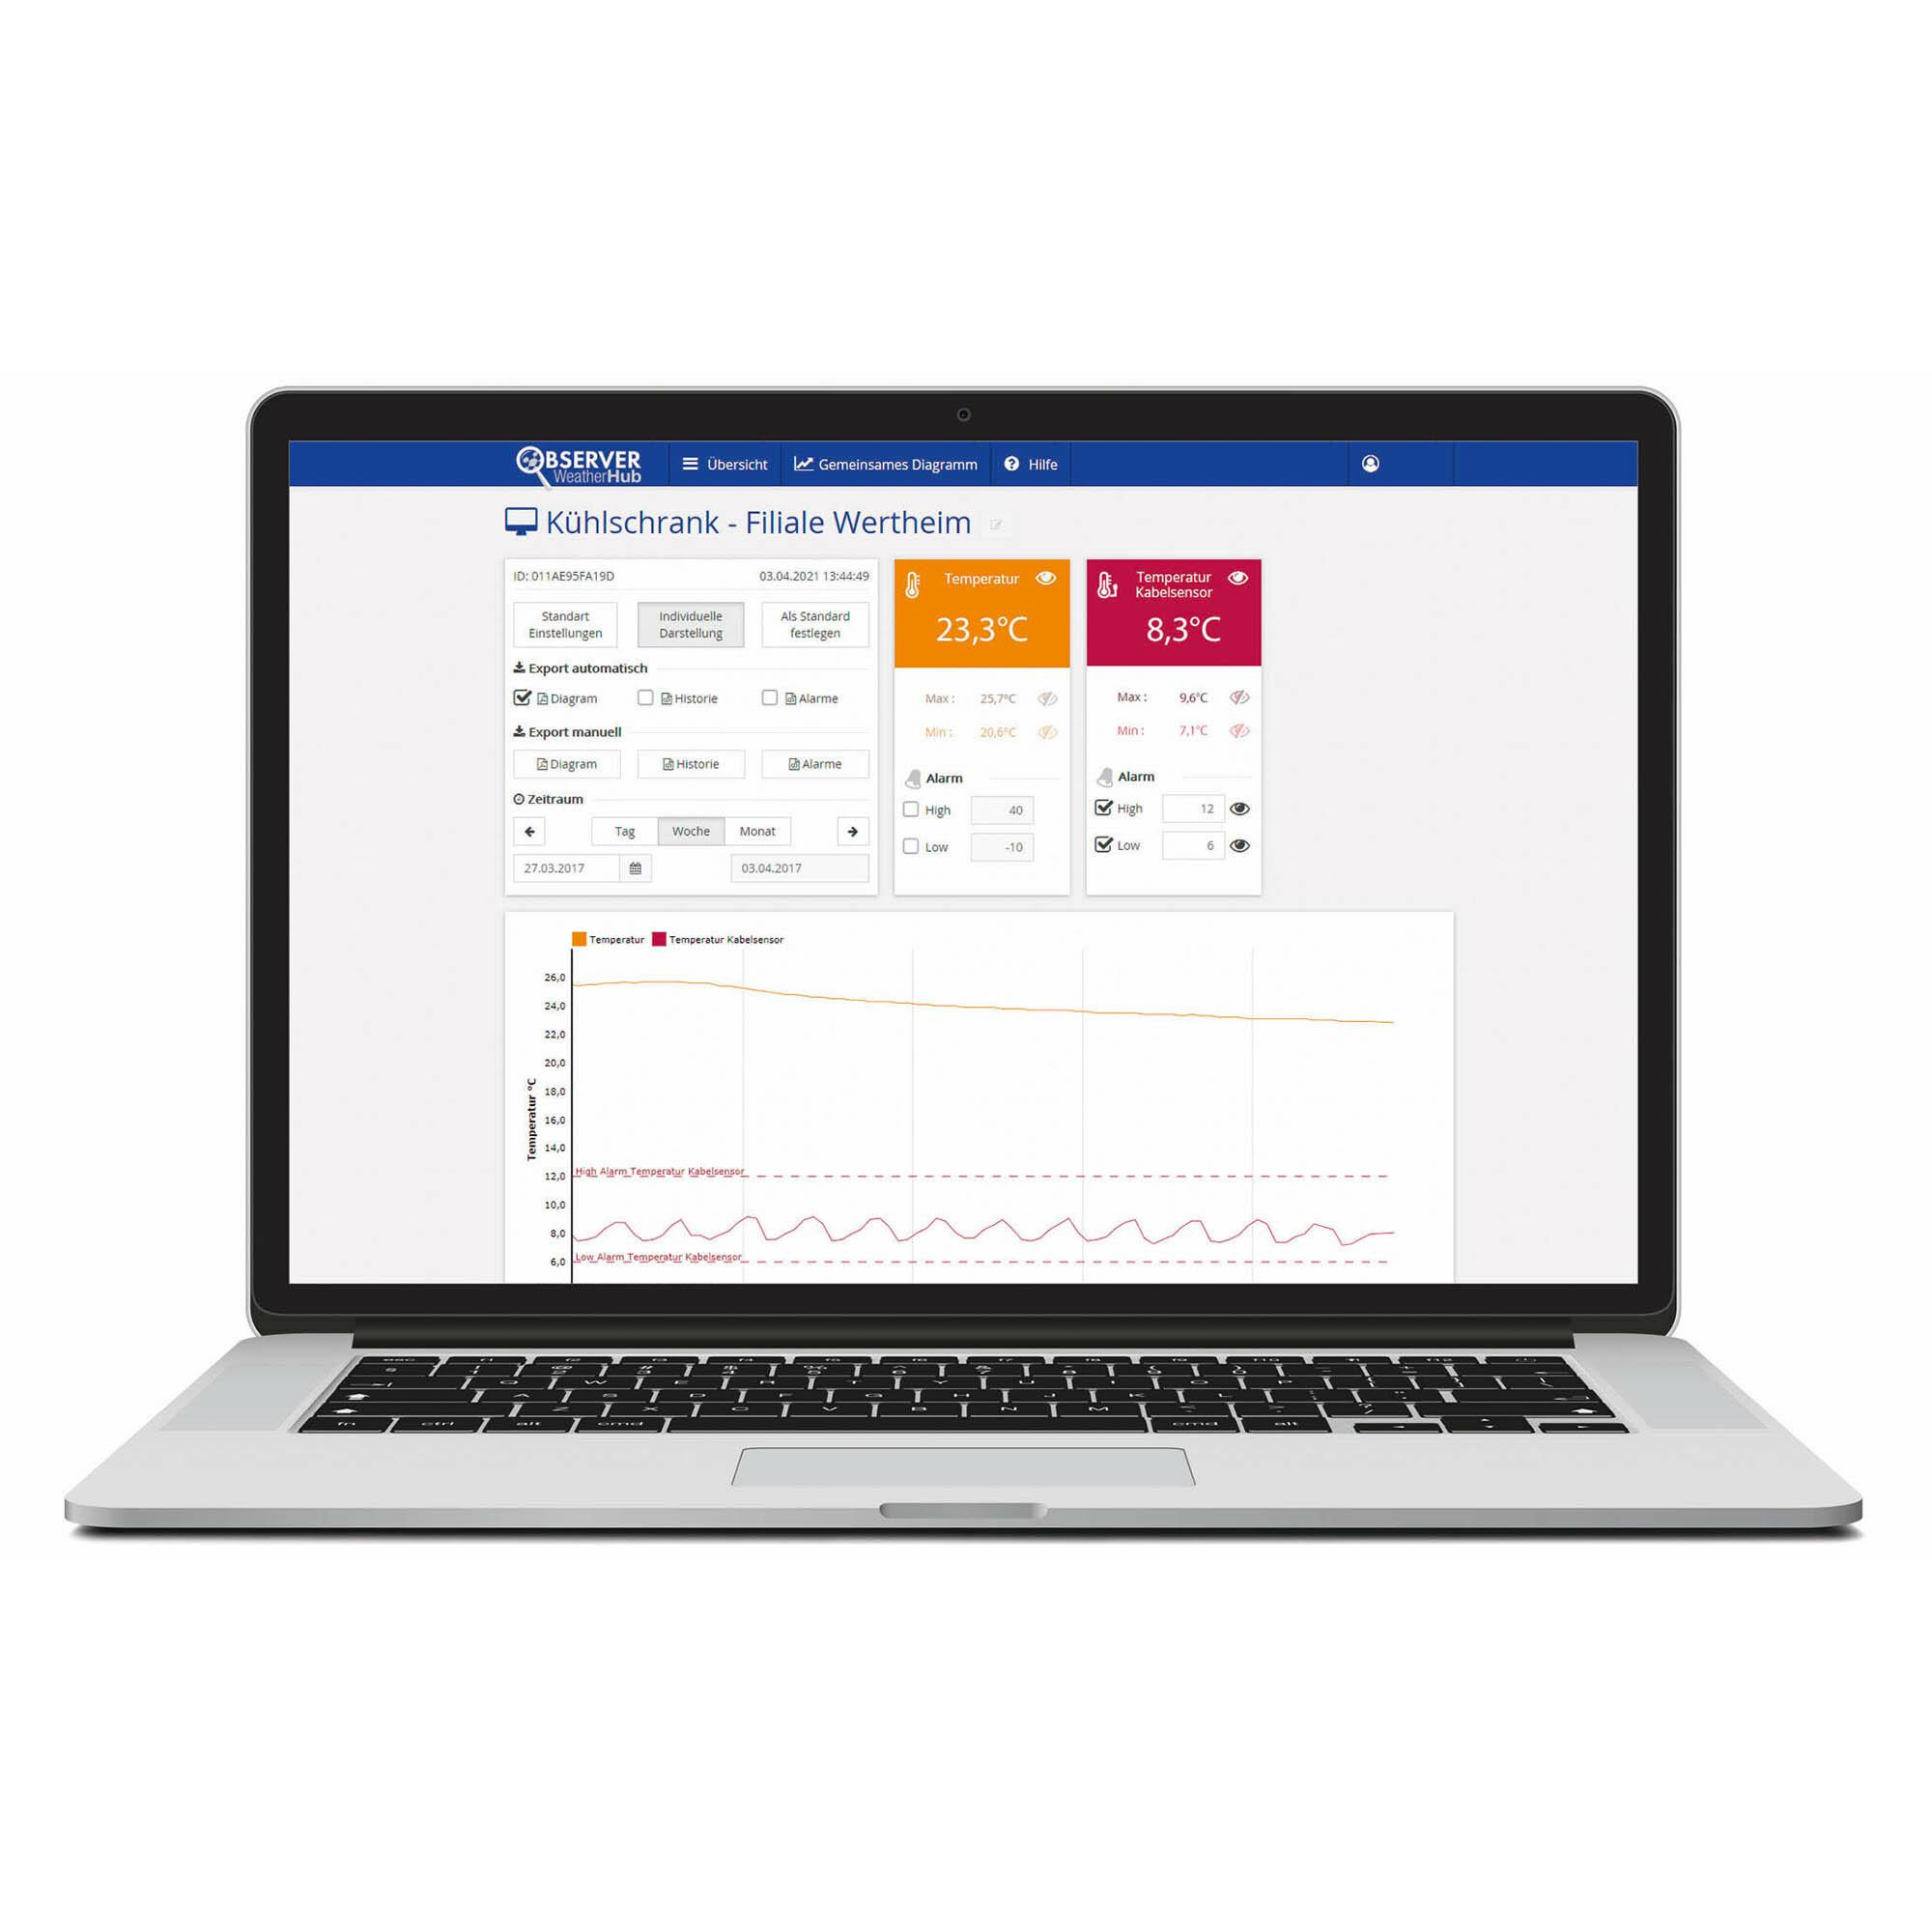 Laptop Kopie_Datum.jpg